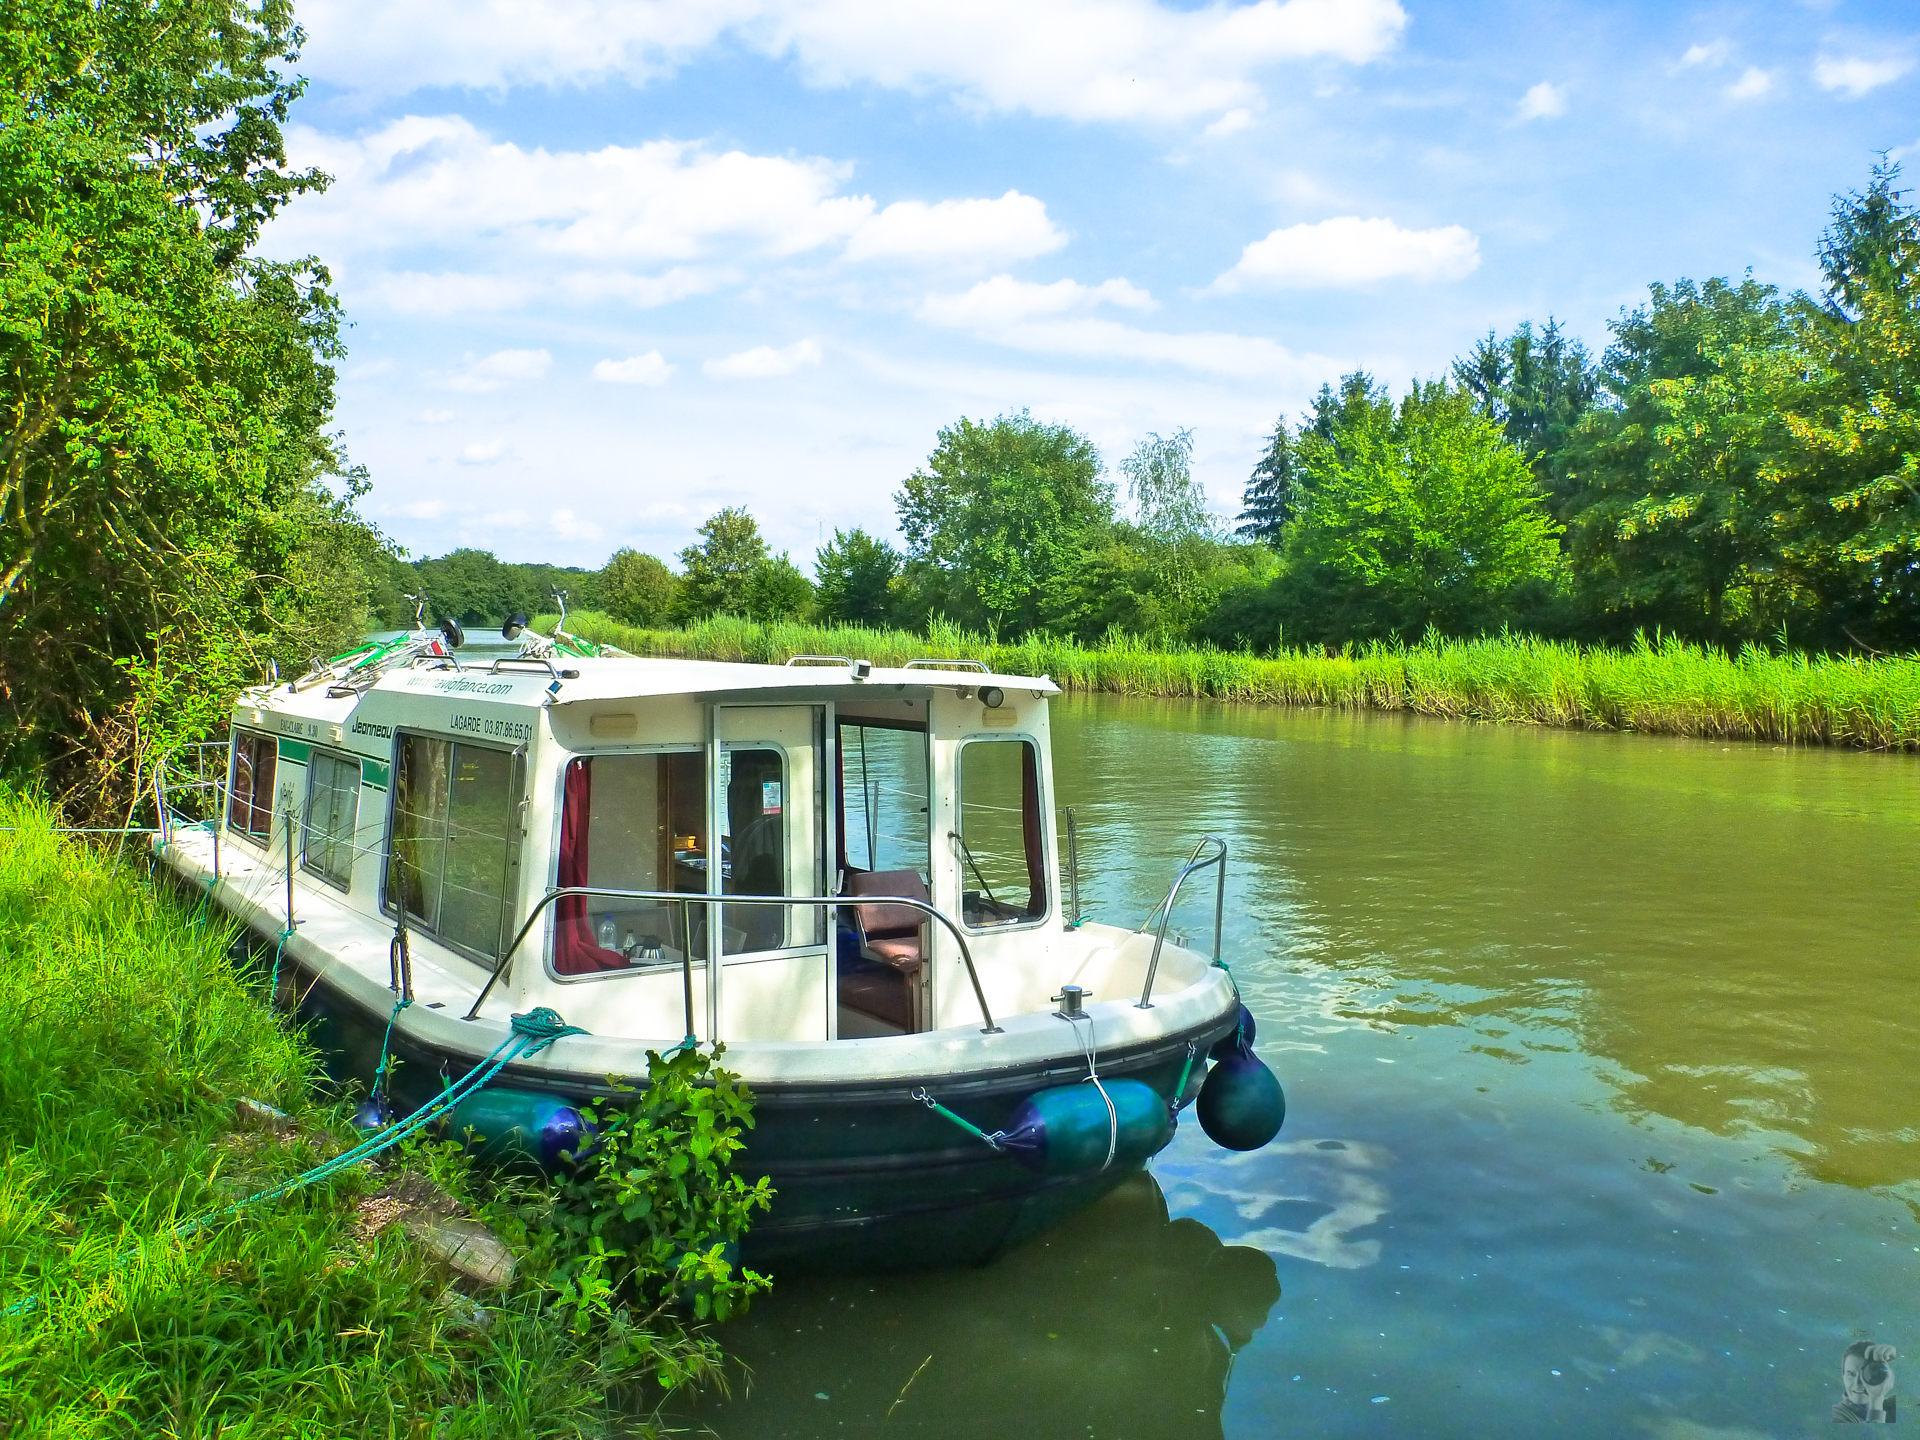 Bateau Cerise, Eau Claire 930-Canal Marne au Rhin